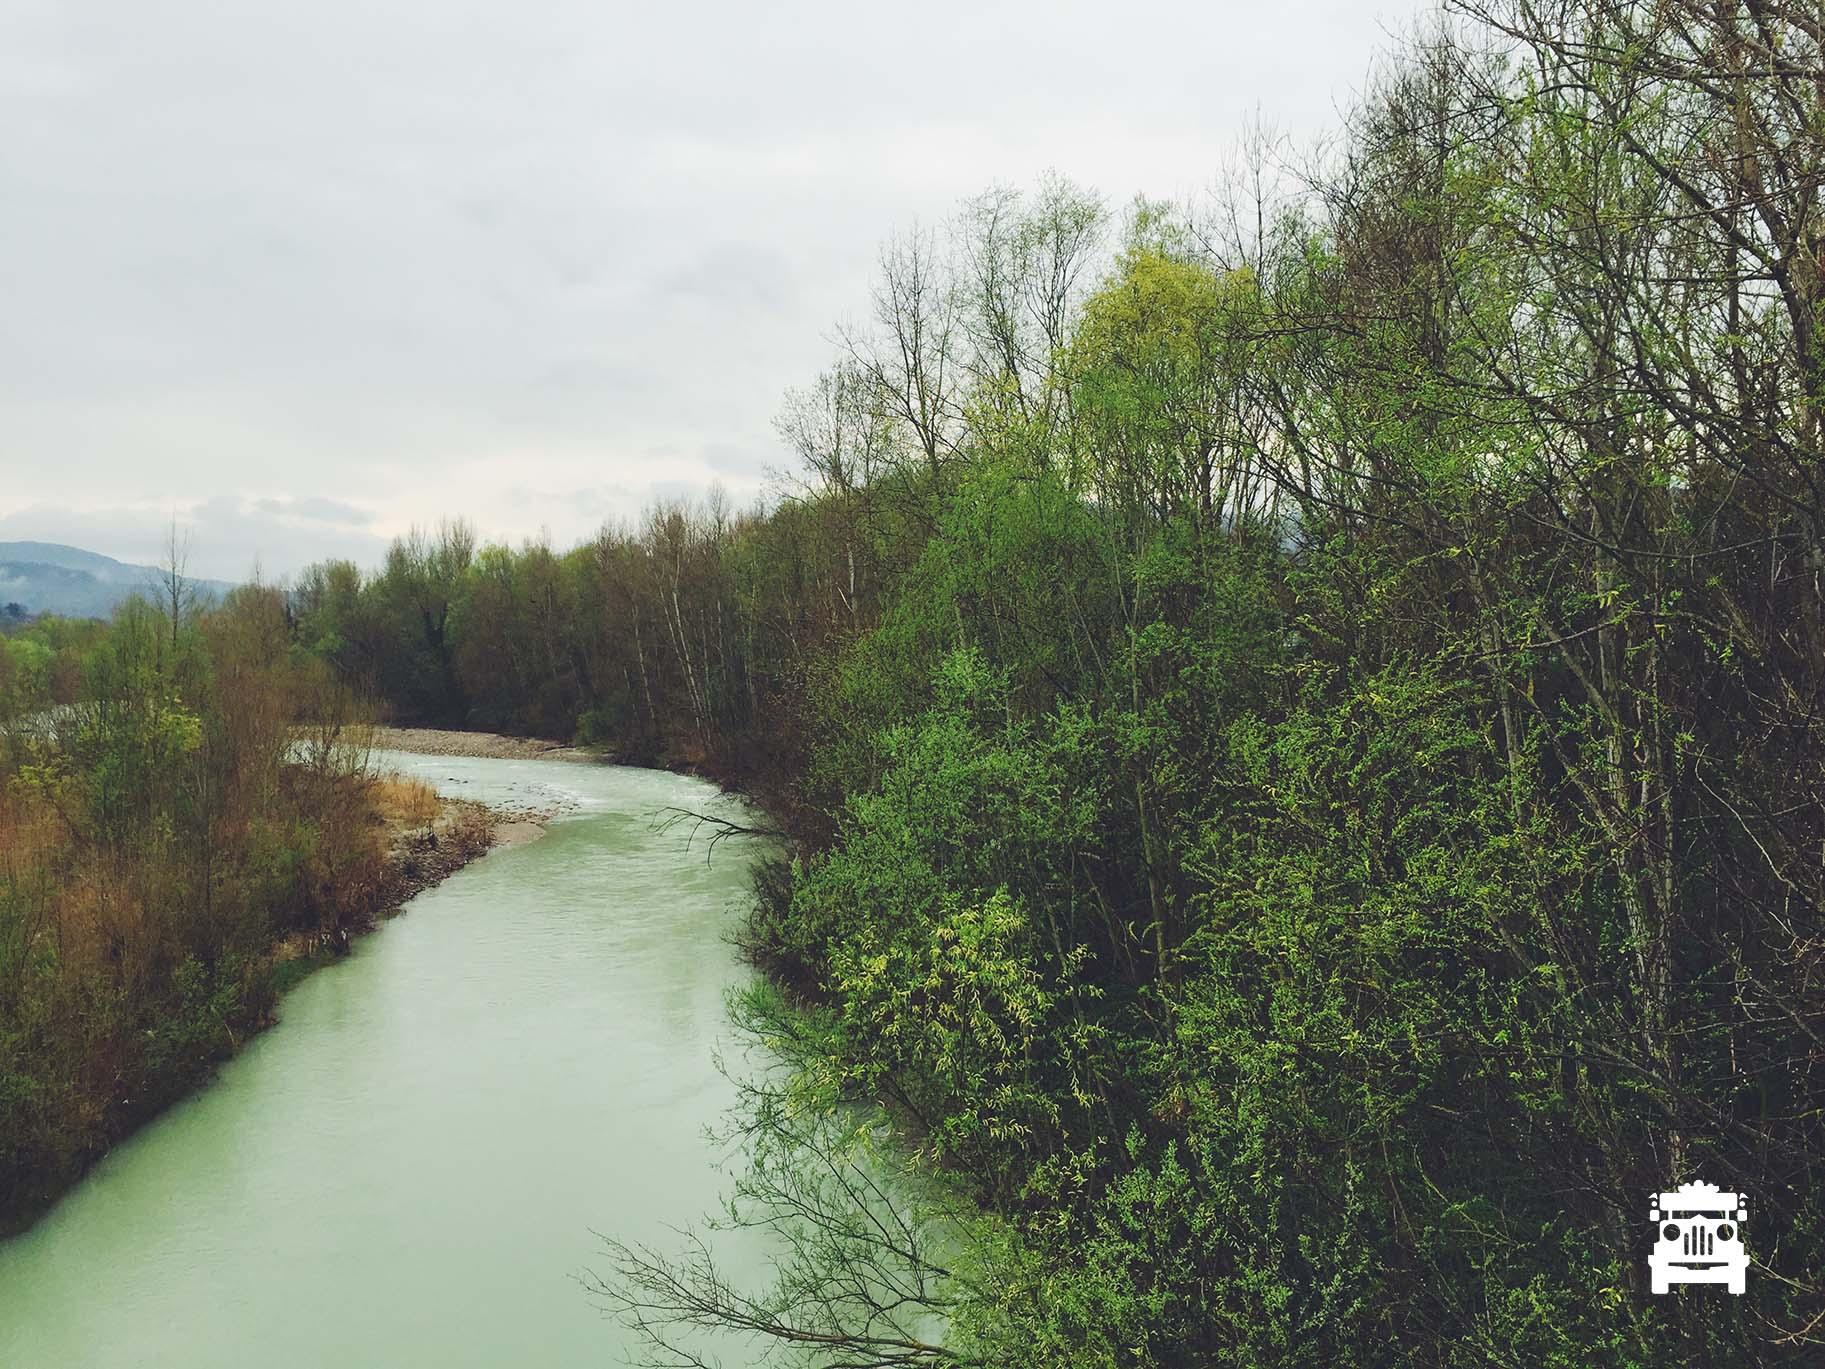 Savio River that crosses the town